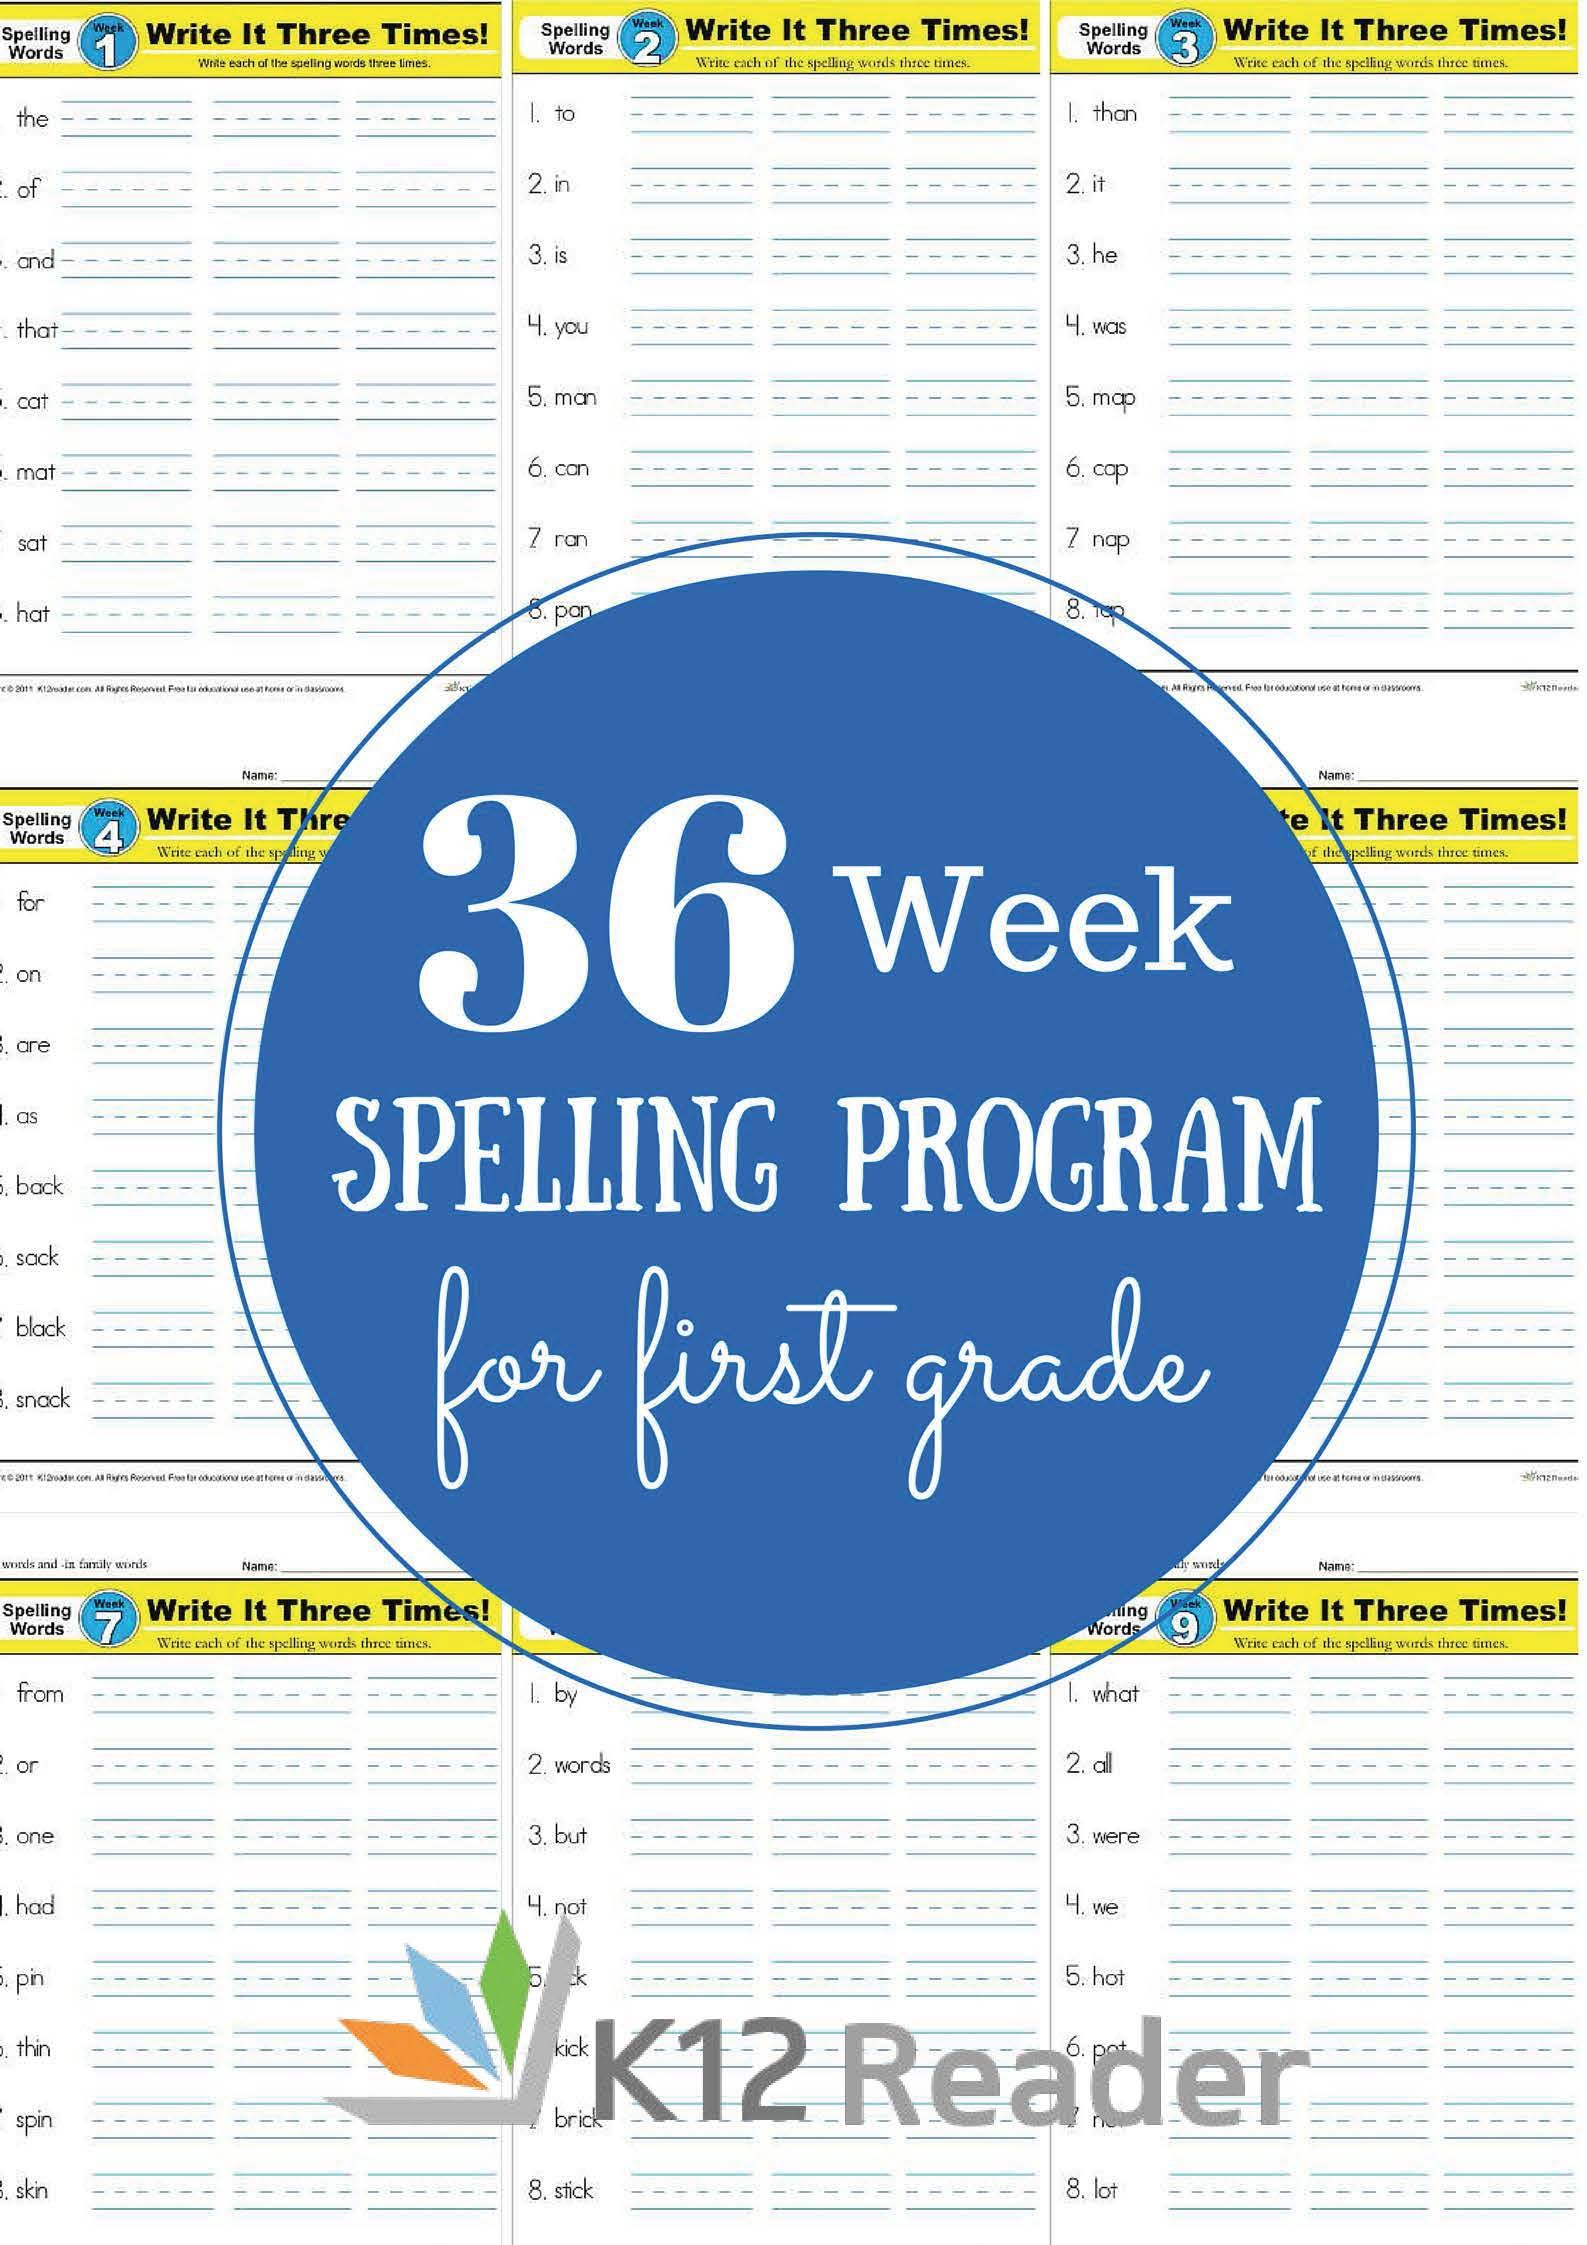 Worksheet Online Spelling Program first grade spelling words free 1st weekly list printable 36 week program newly designed for www k12reader